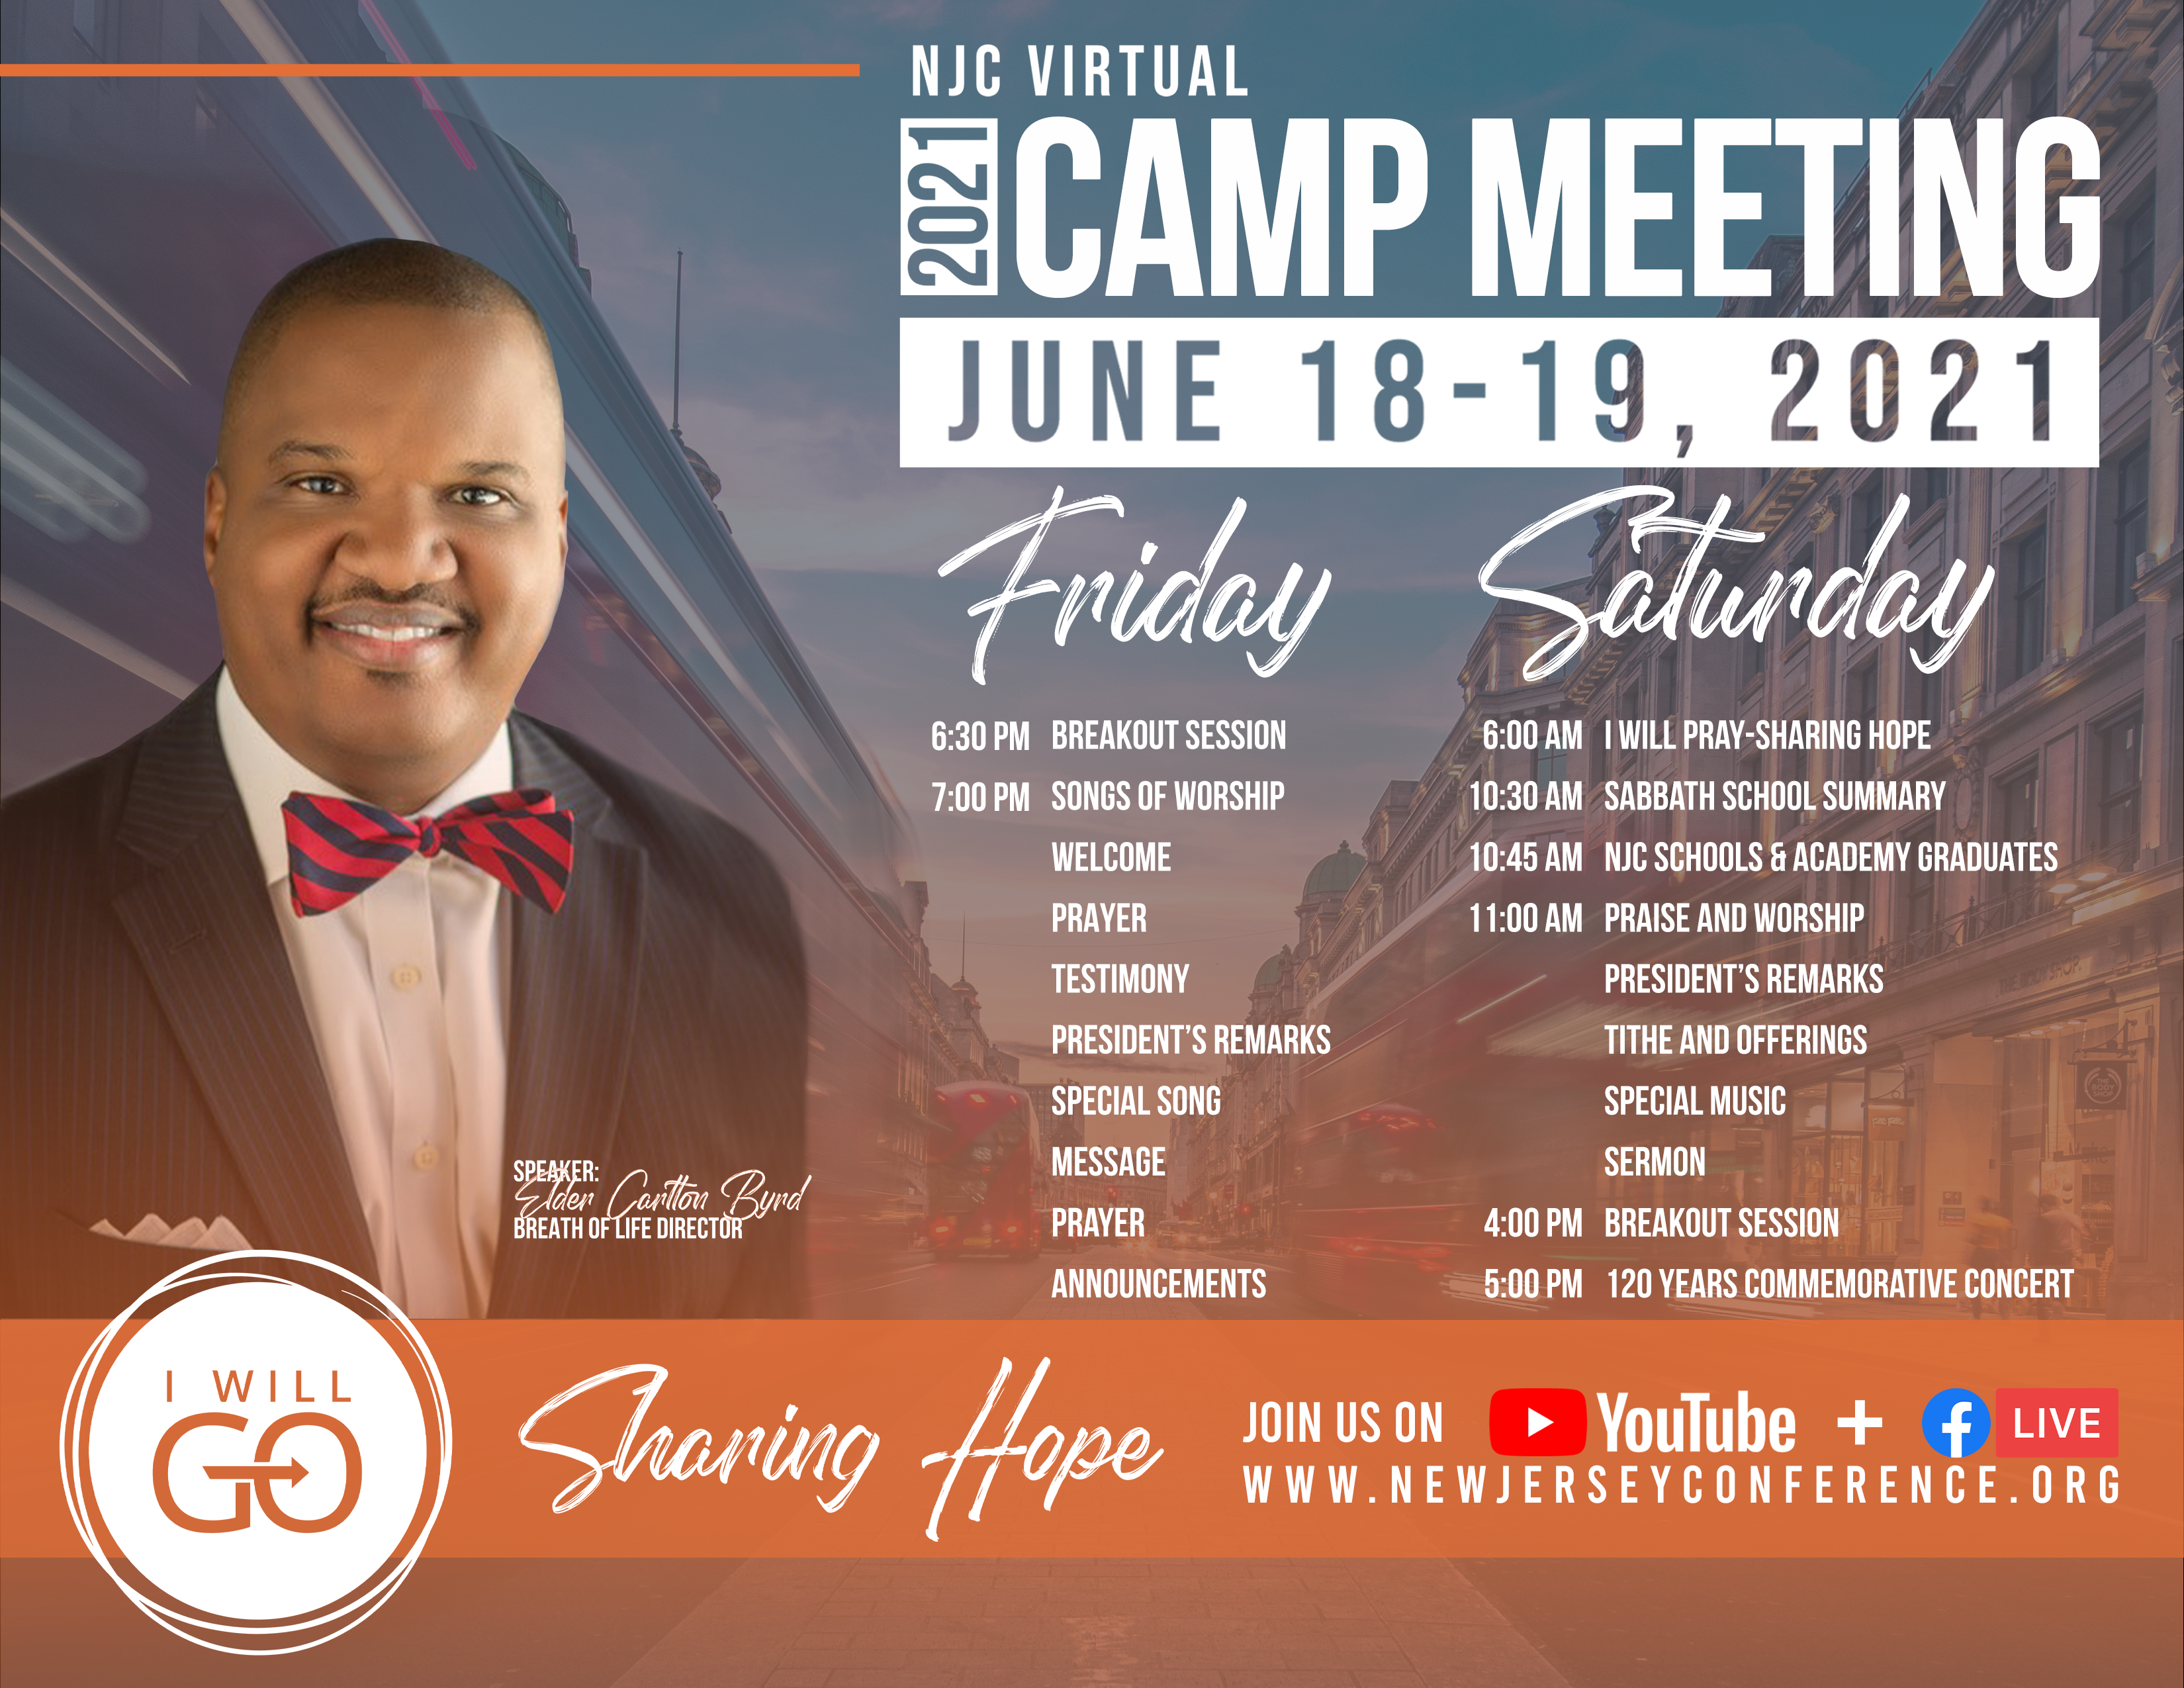 Camp Meeting 2021